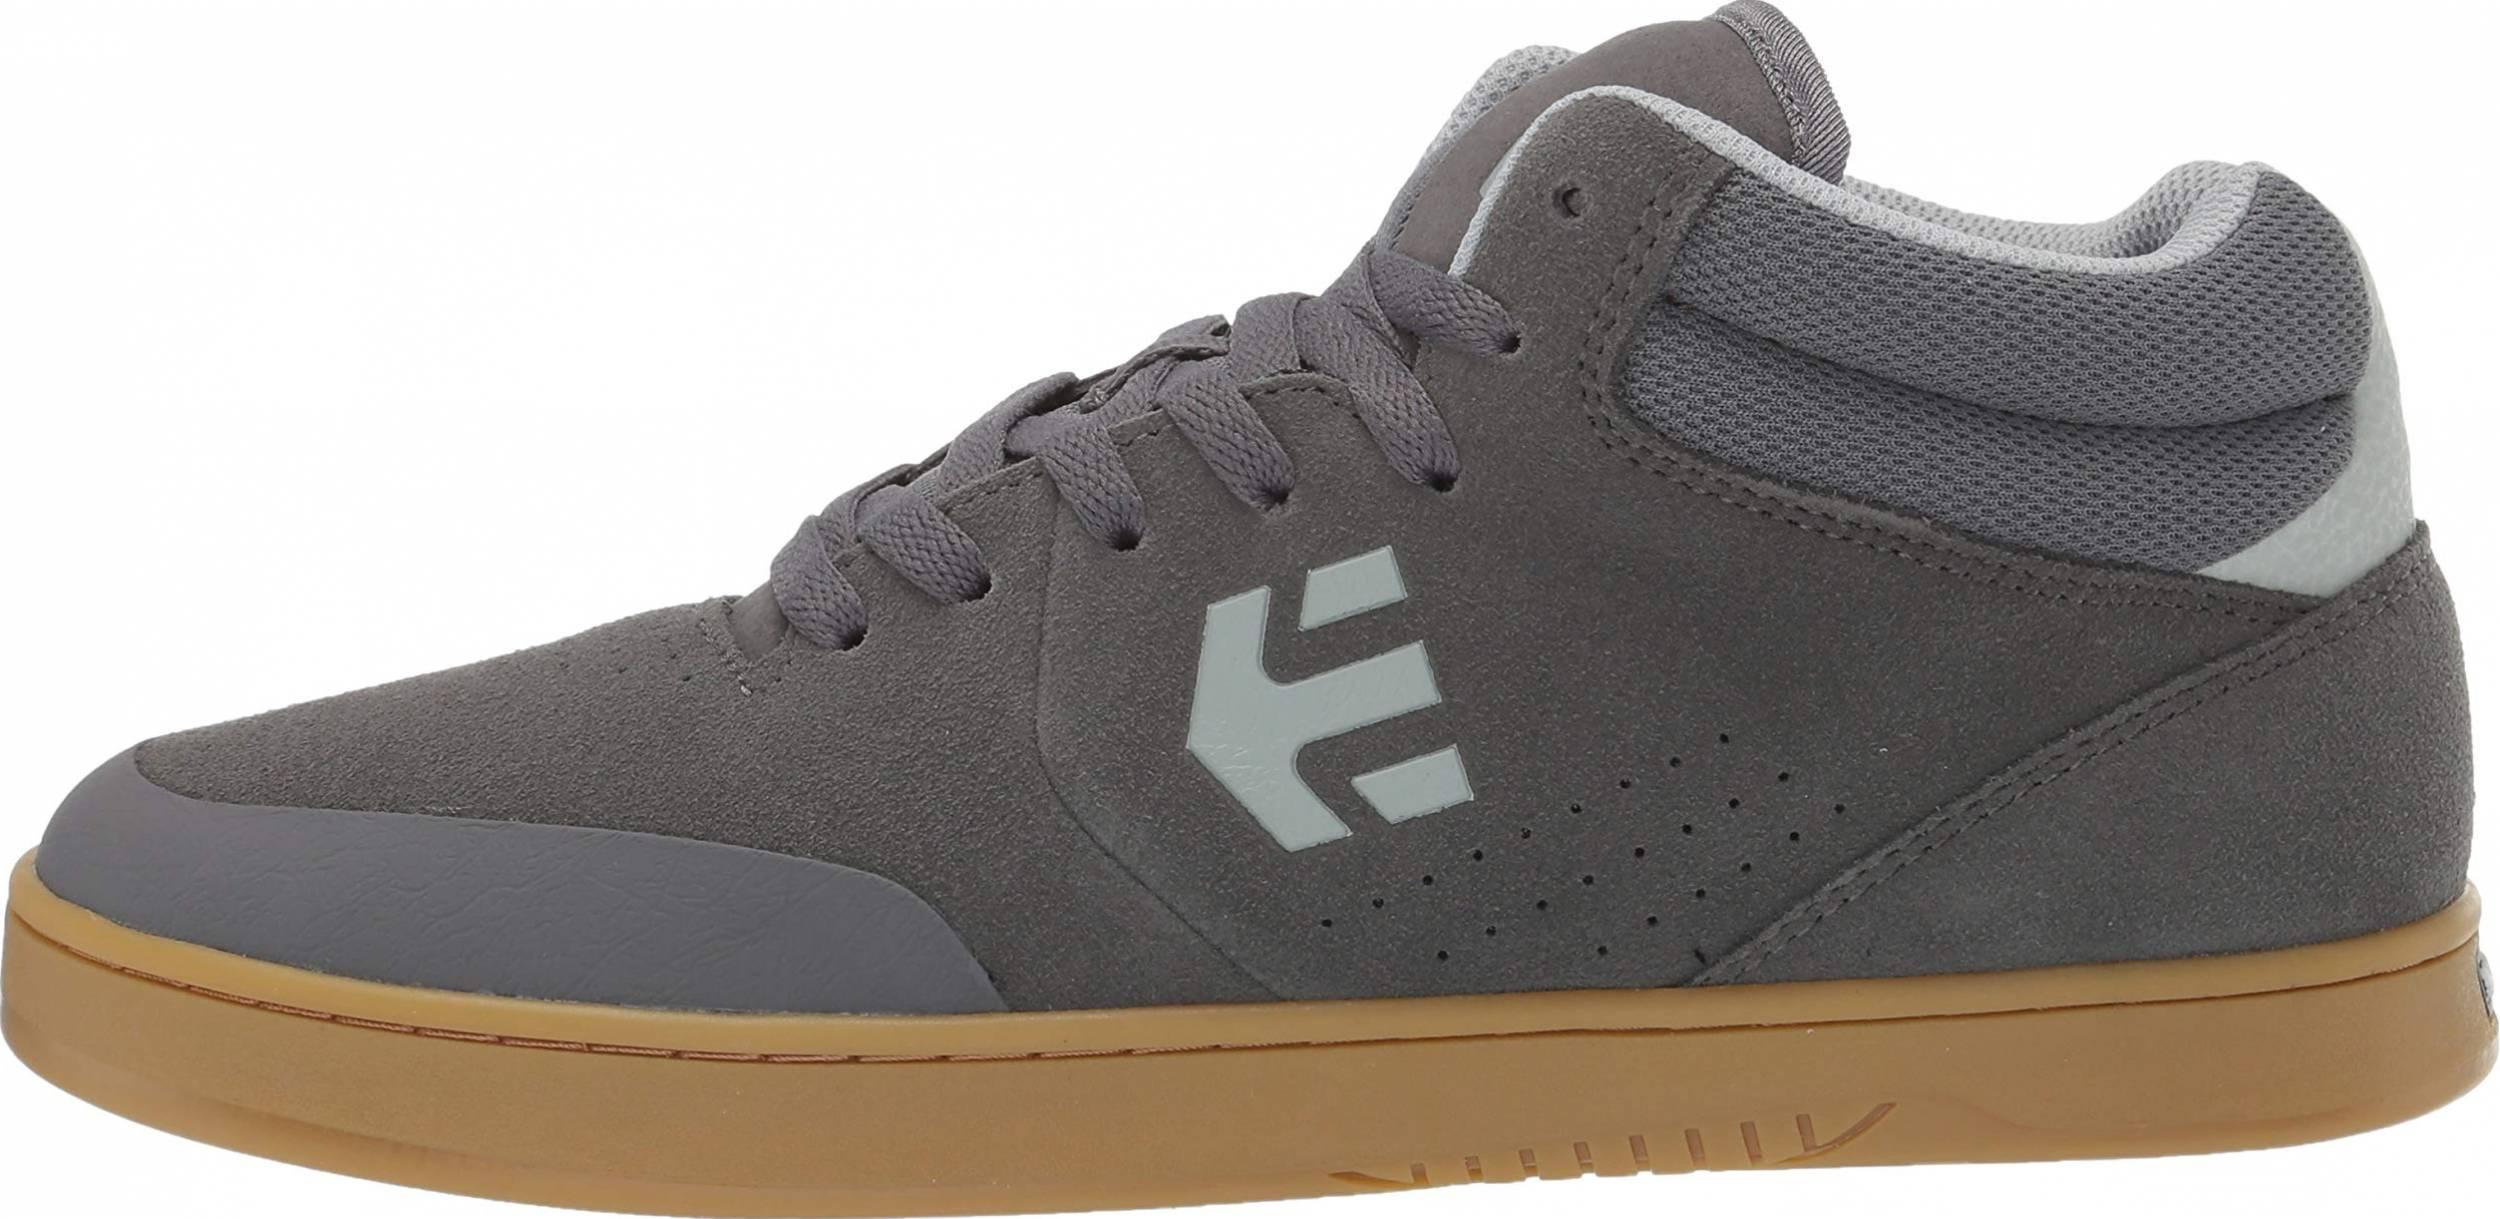 etnies skateboard shoes